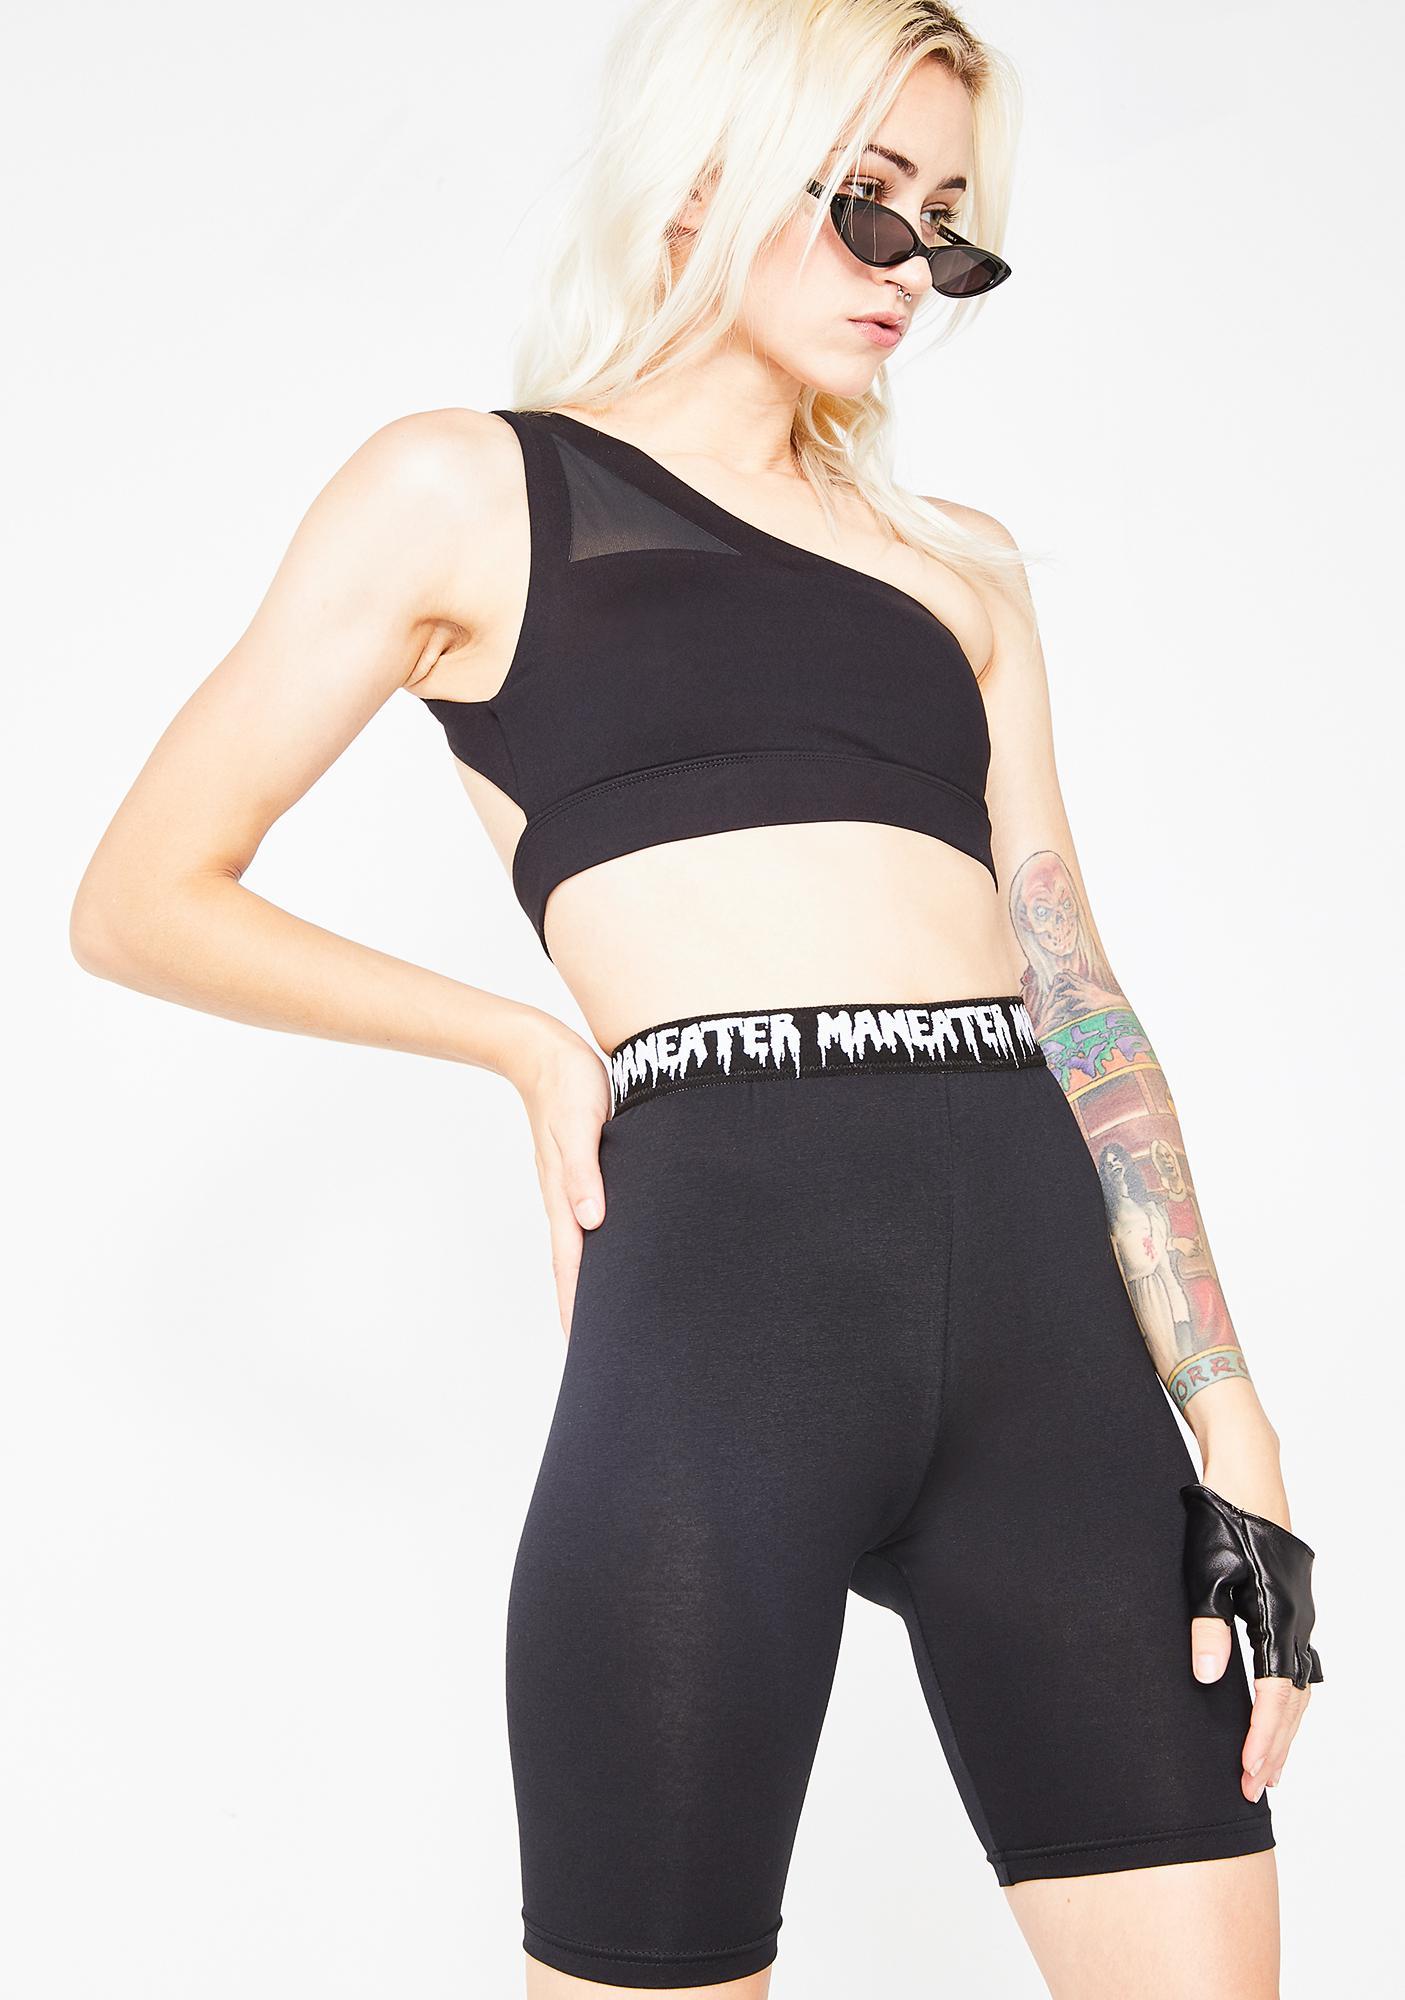 ManEater Misty Sports Bra